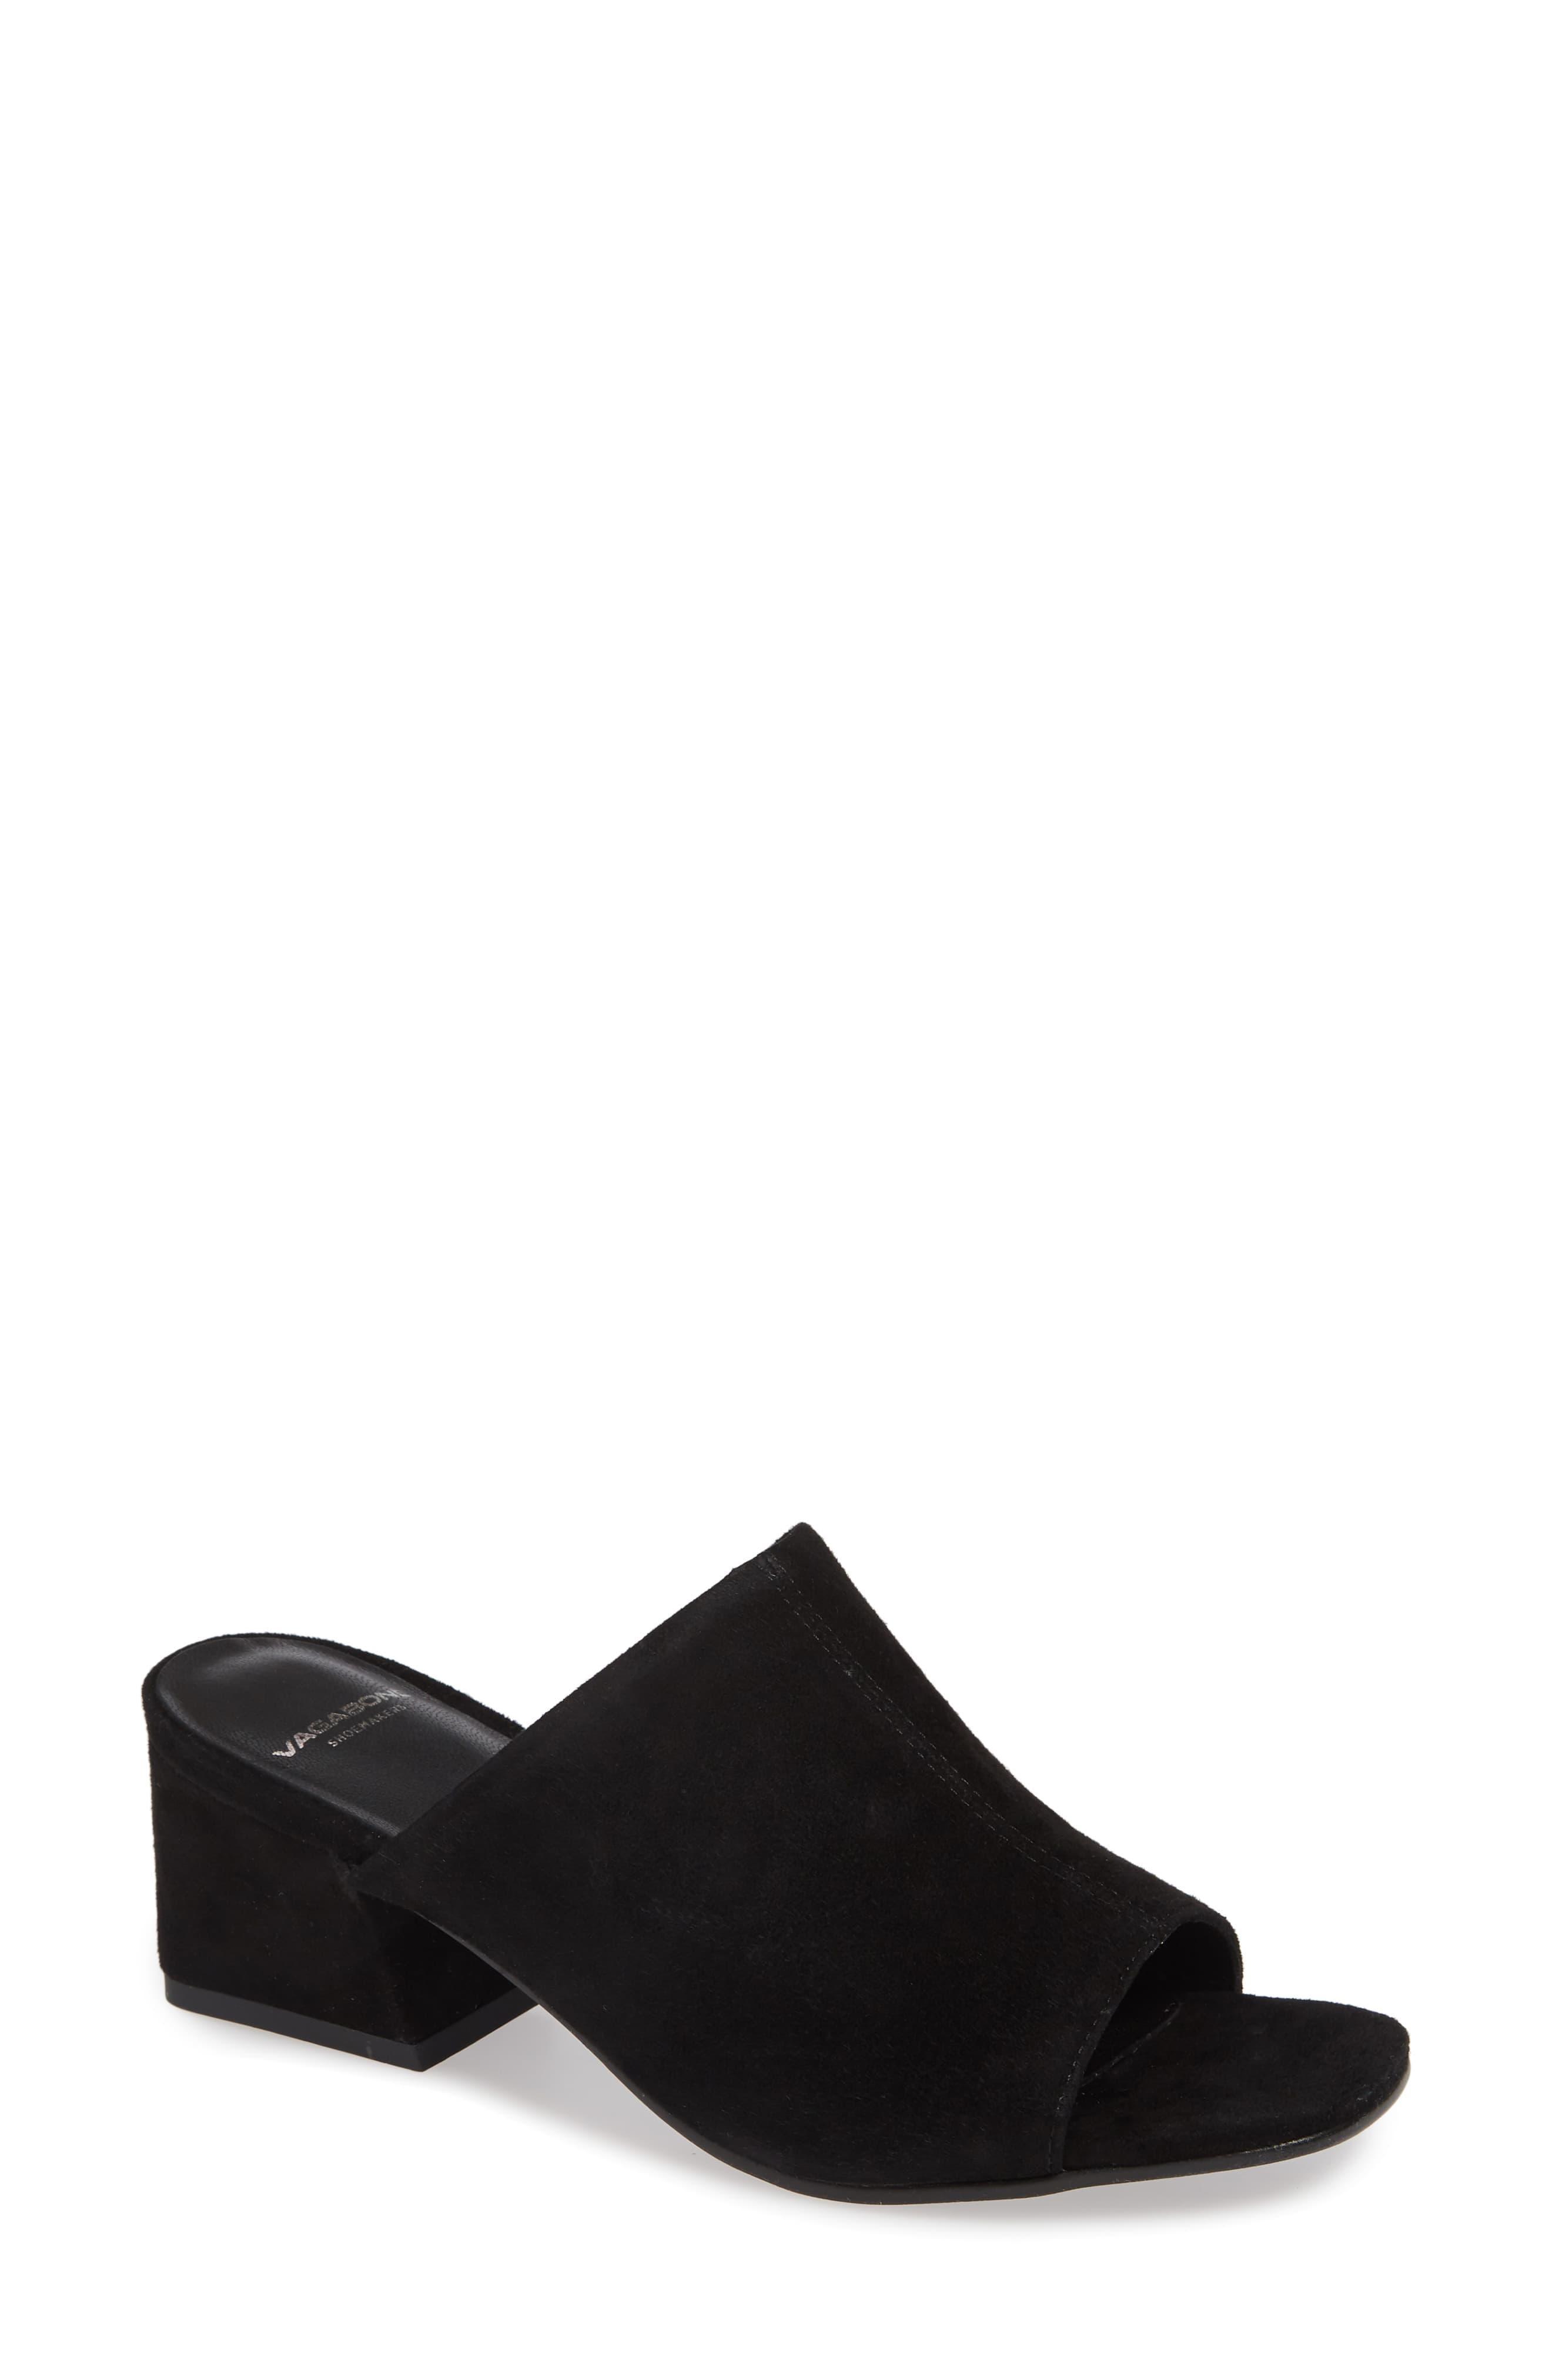 2c05597cbf Vagabond Shoemakers Elena Slide Sandal in Black - Lyst